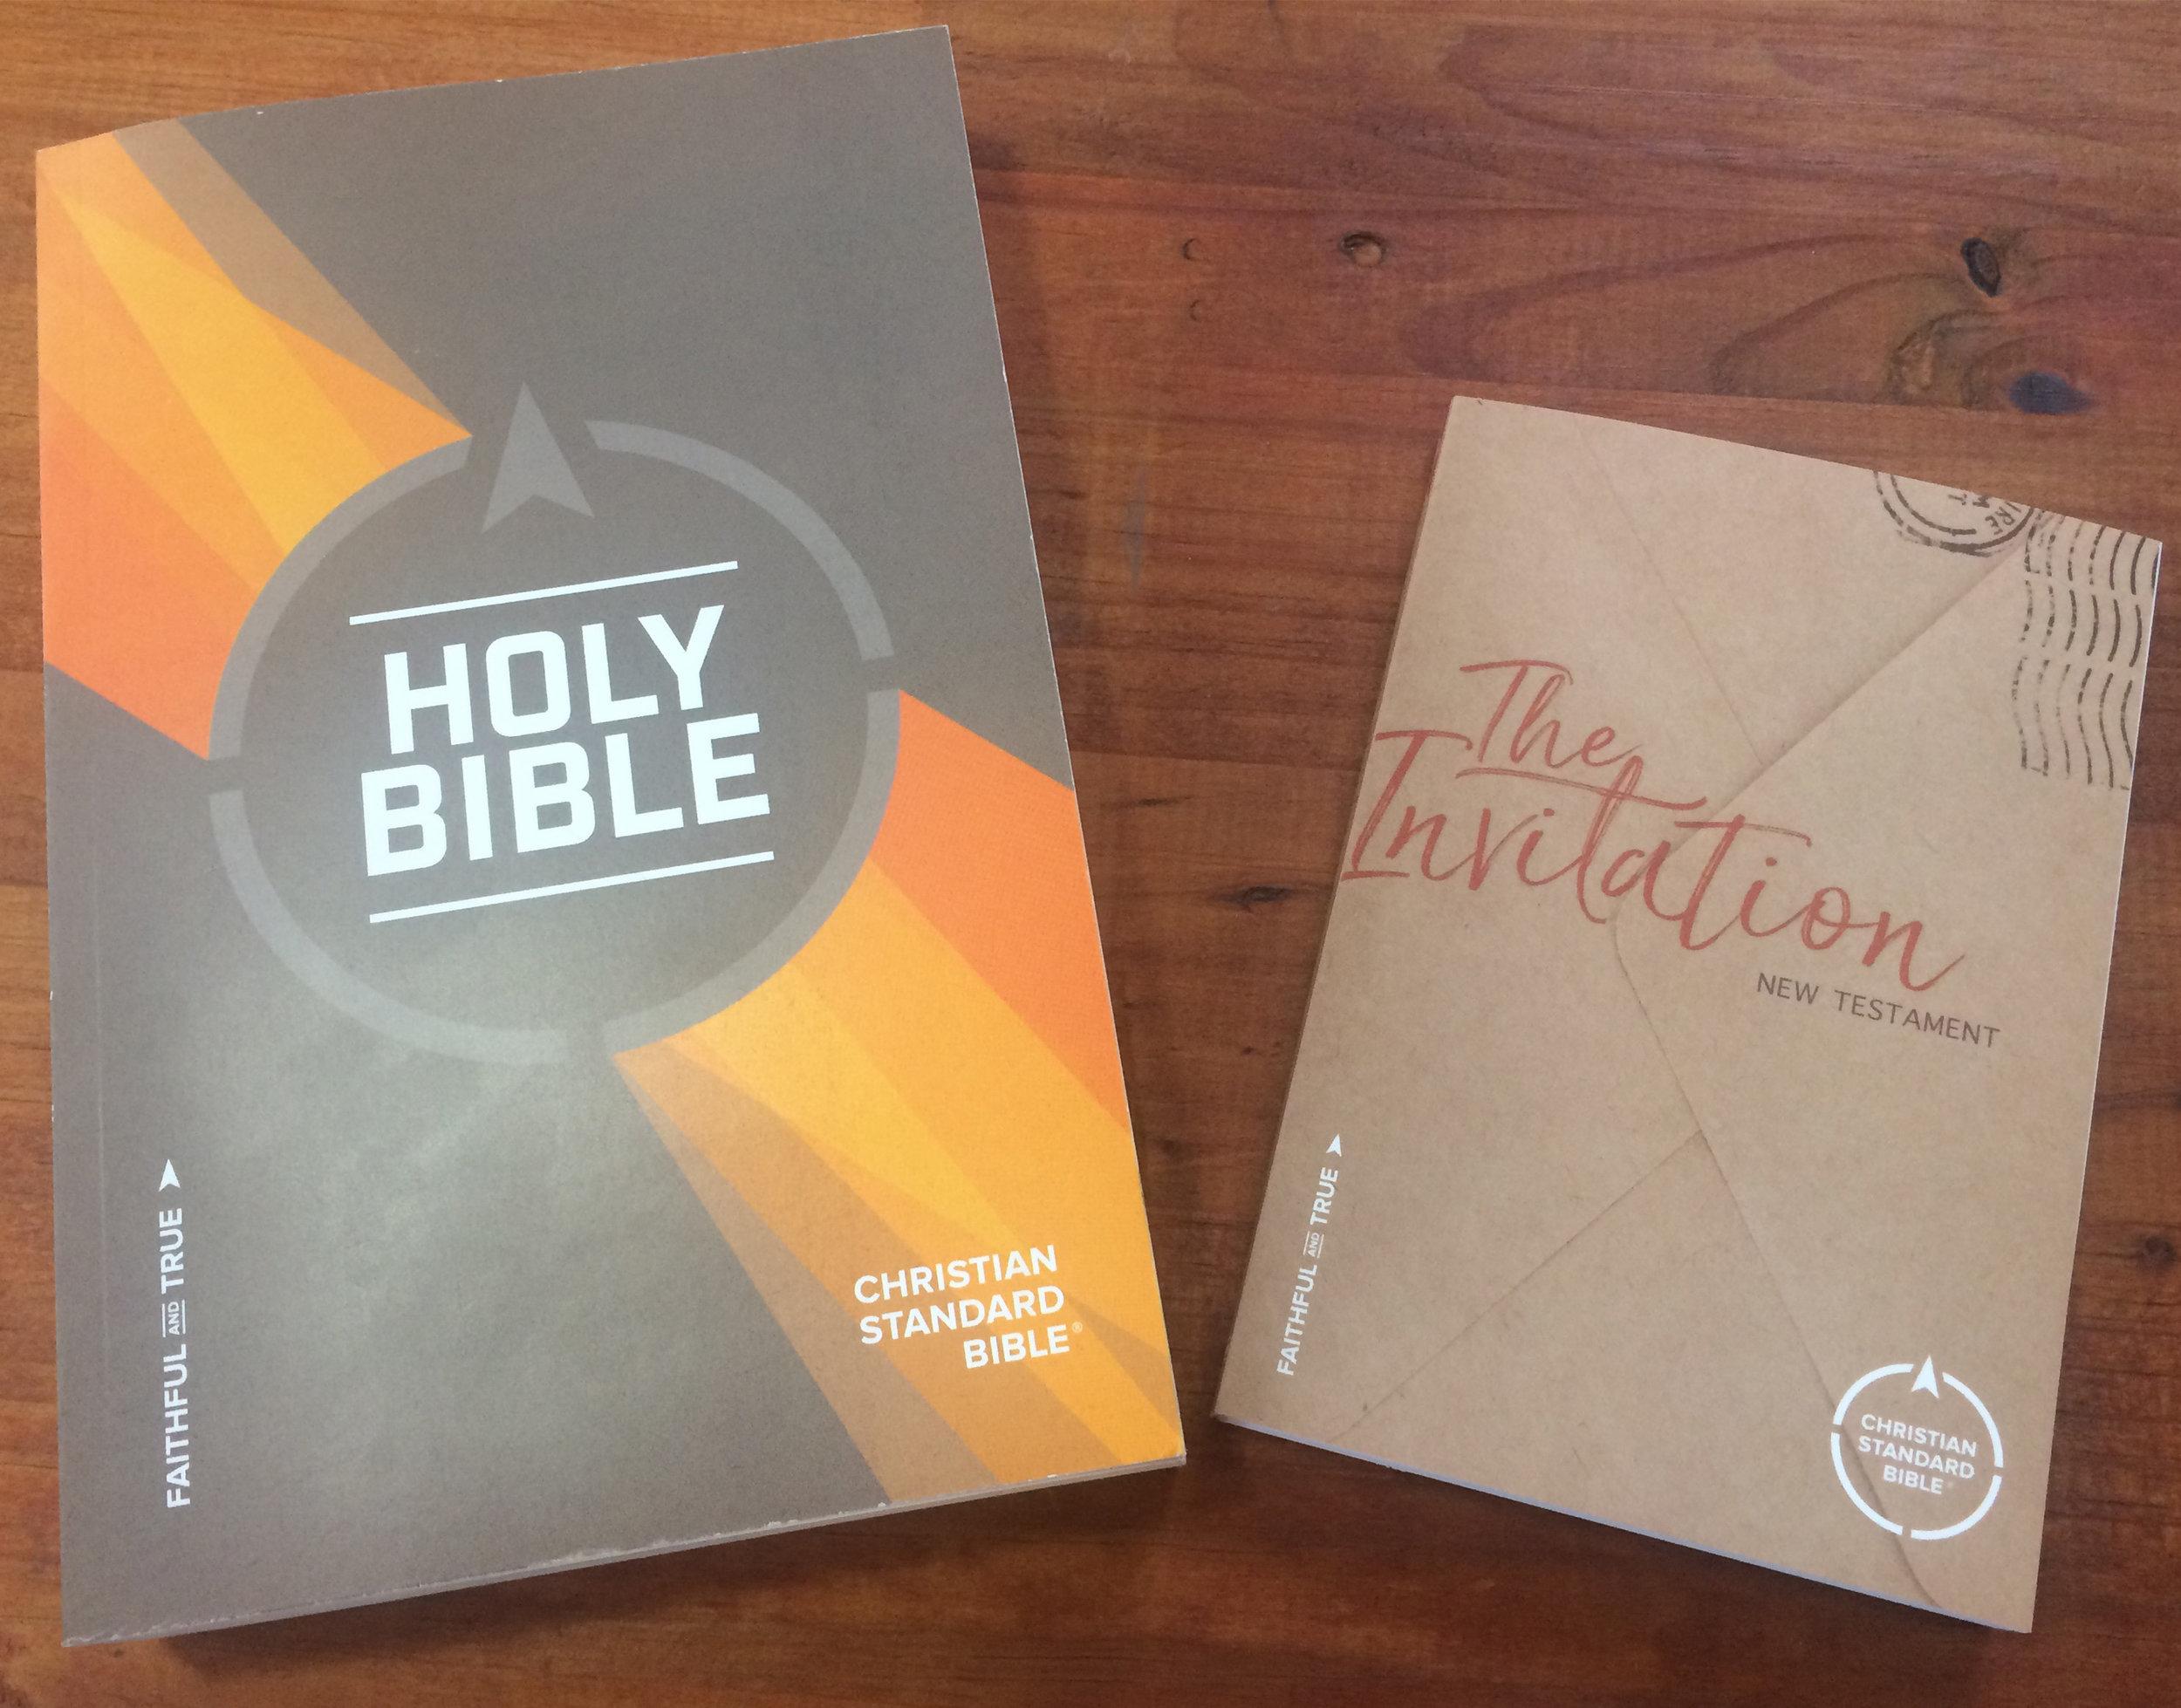 Christian Standard Bible Translation